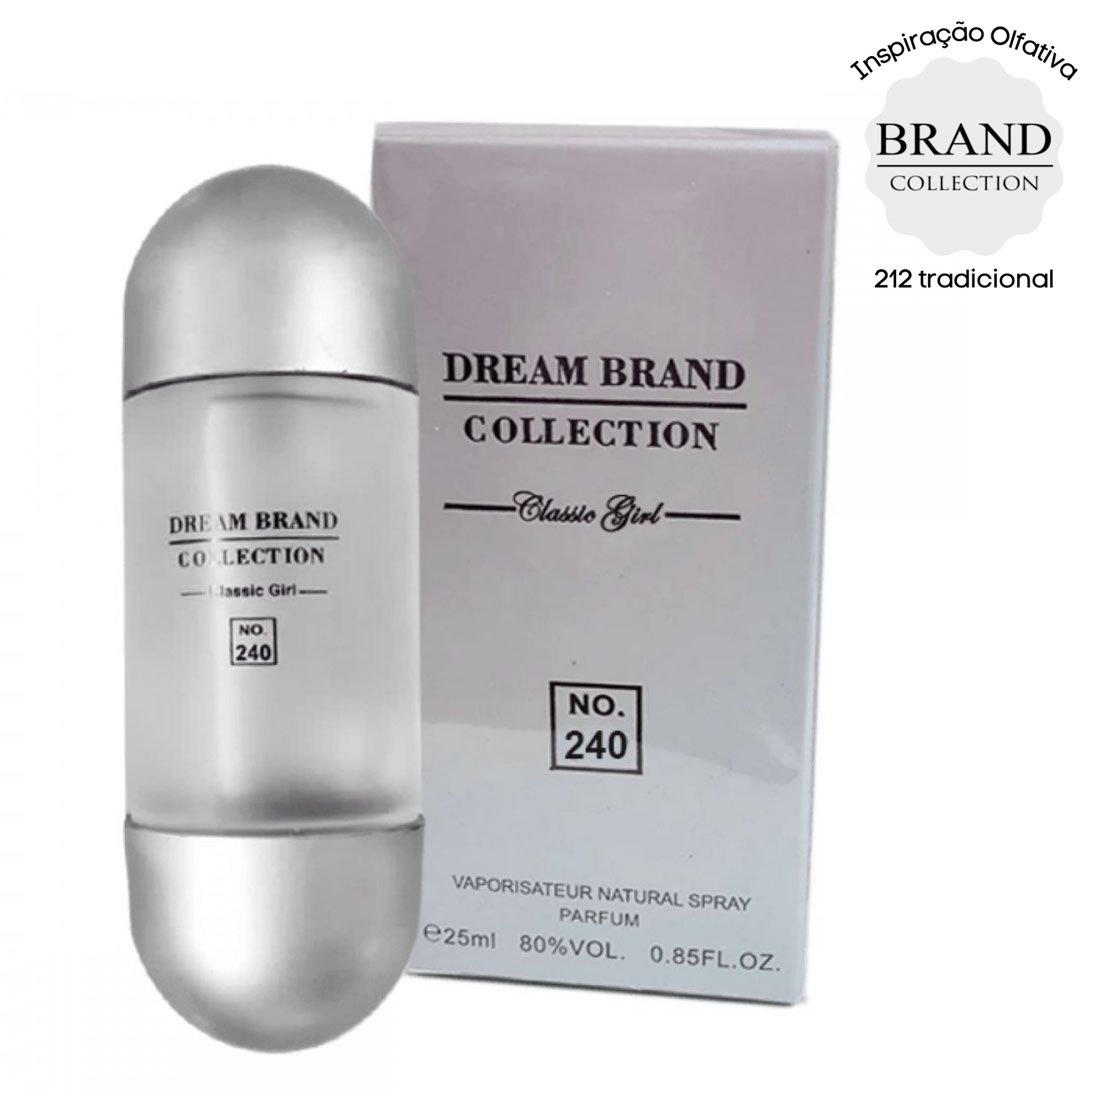 perfume brand collection 240 feminino 25 ml 212 classico 51211 2000 203794 1